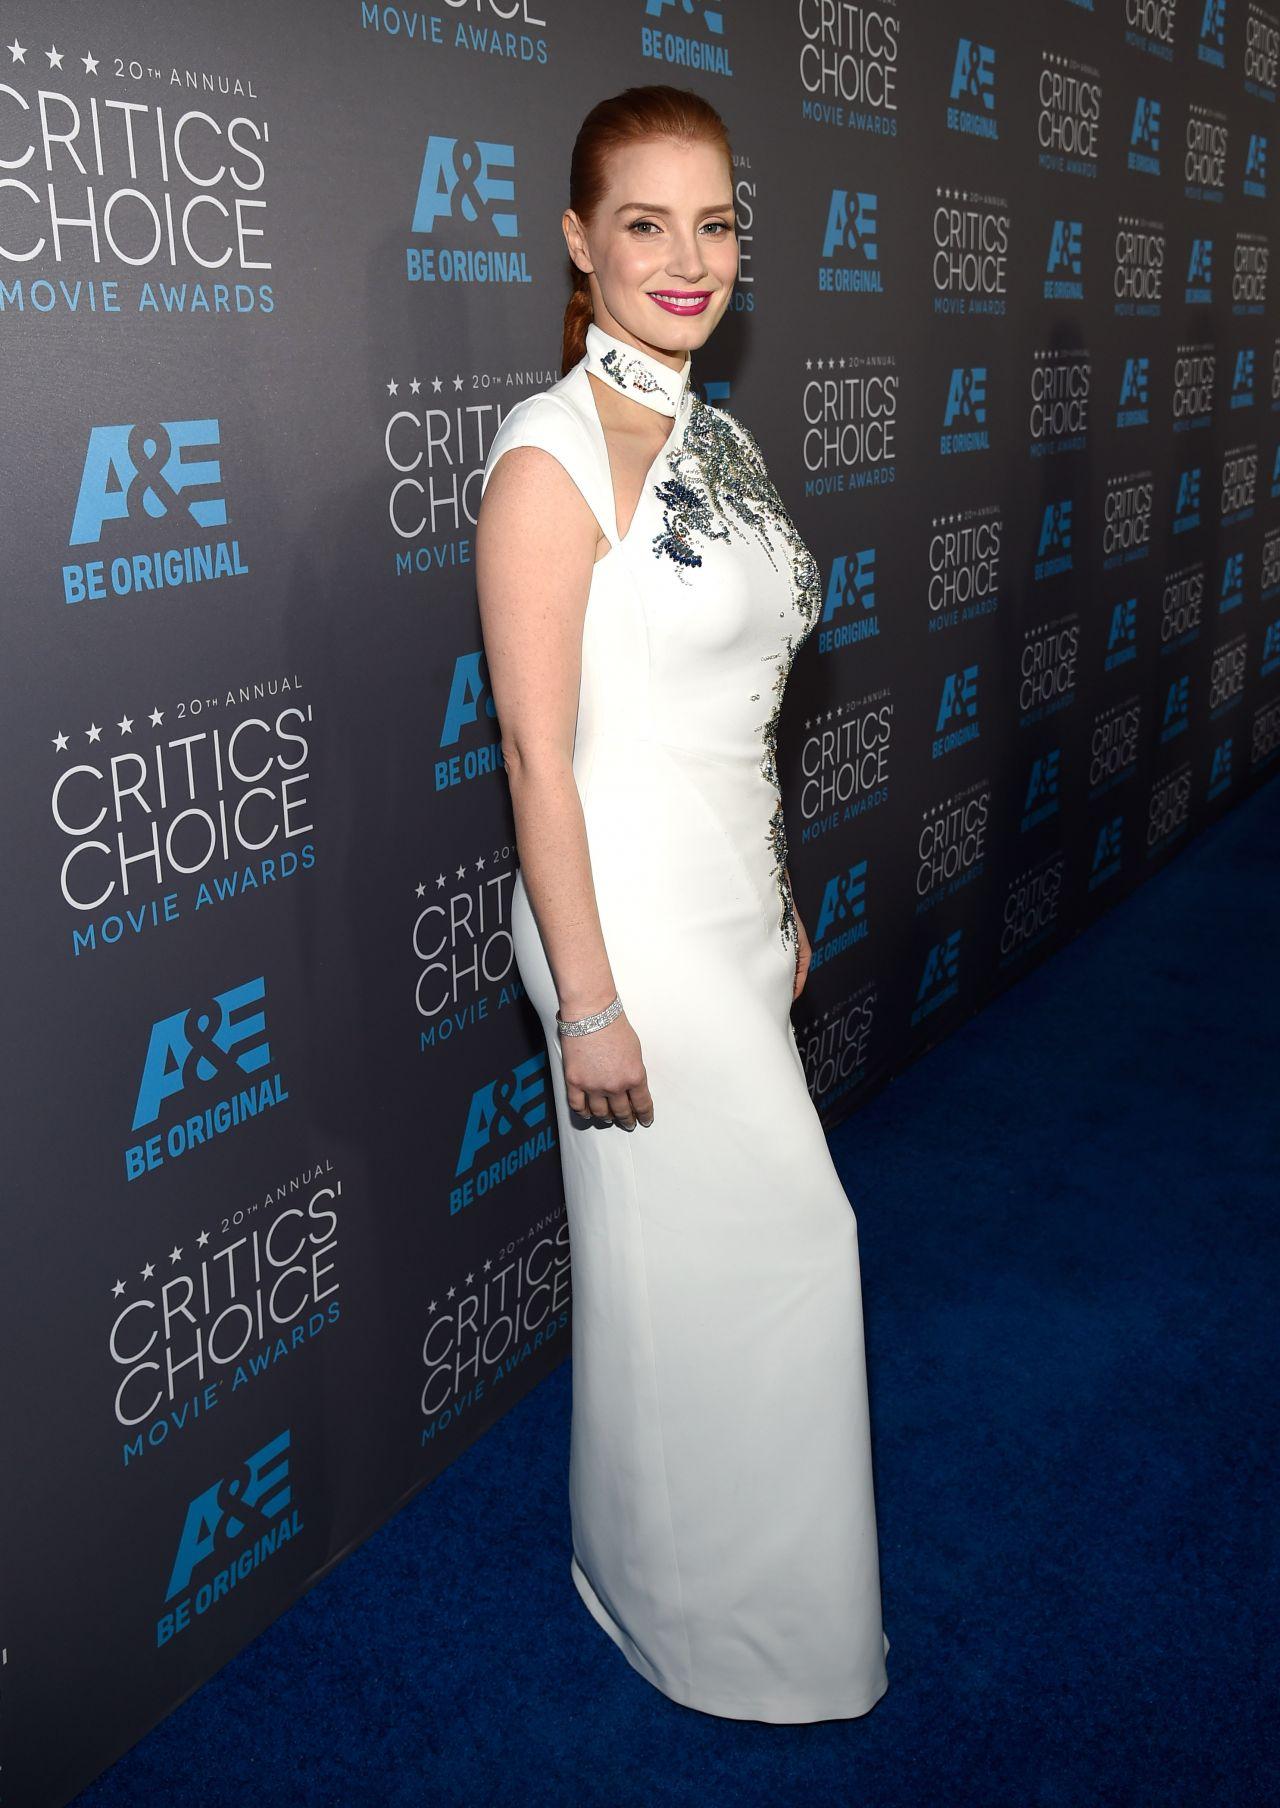 Jessica Chastain - 2015 Celebrity Photos